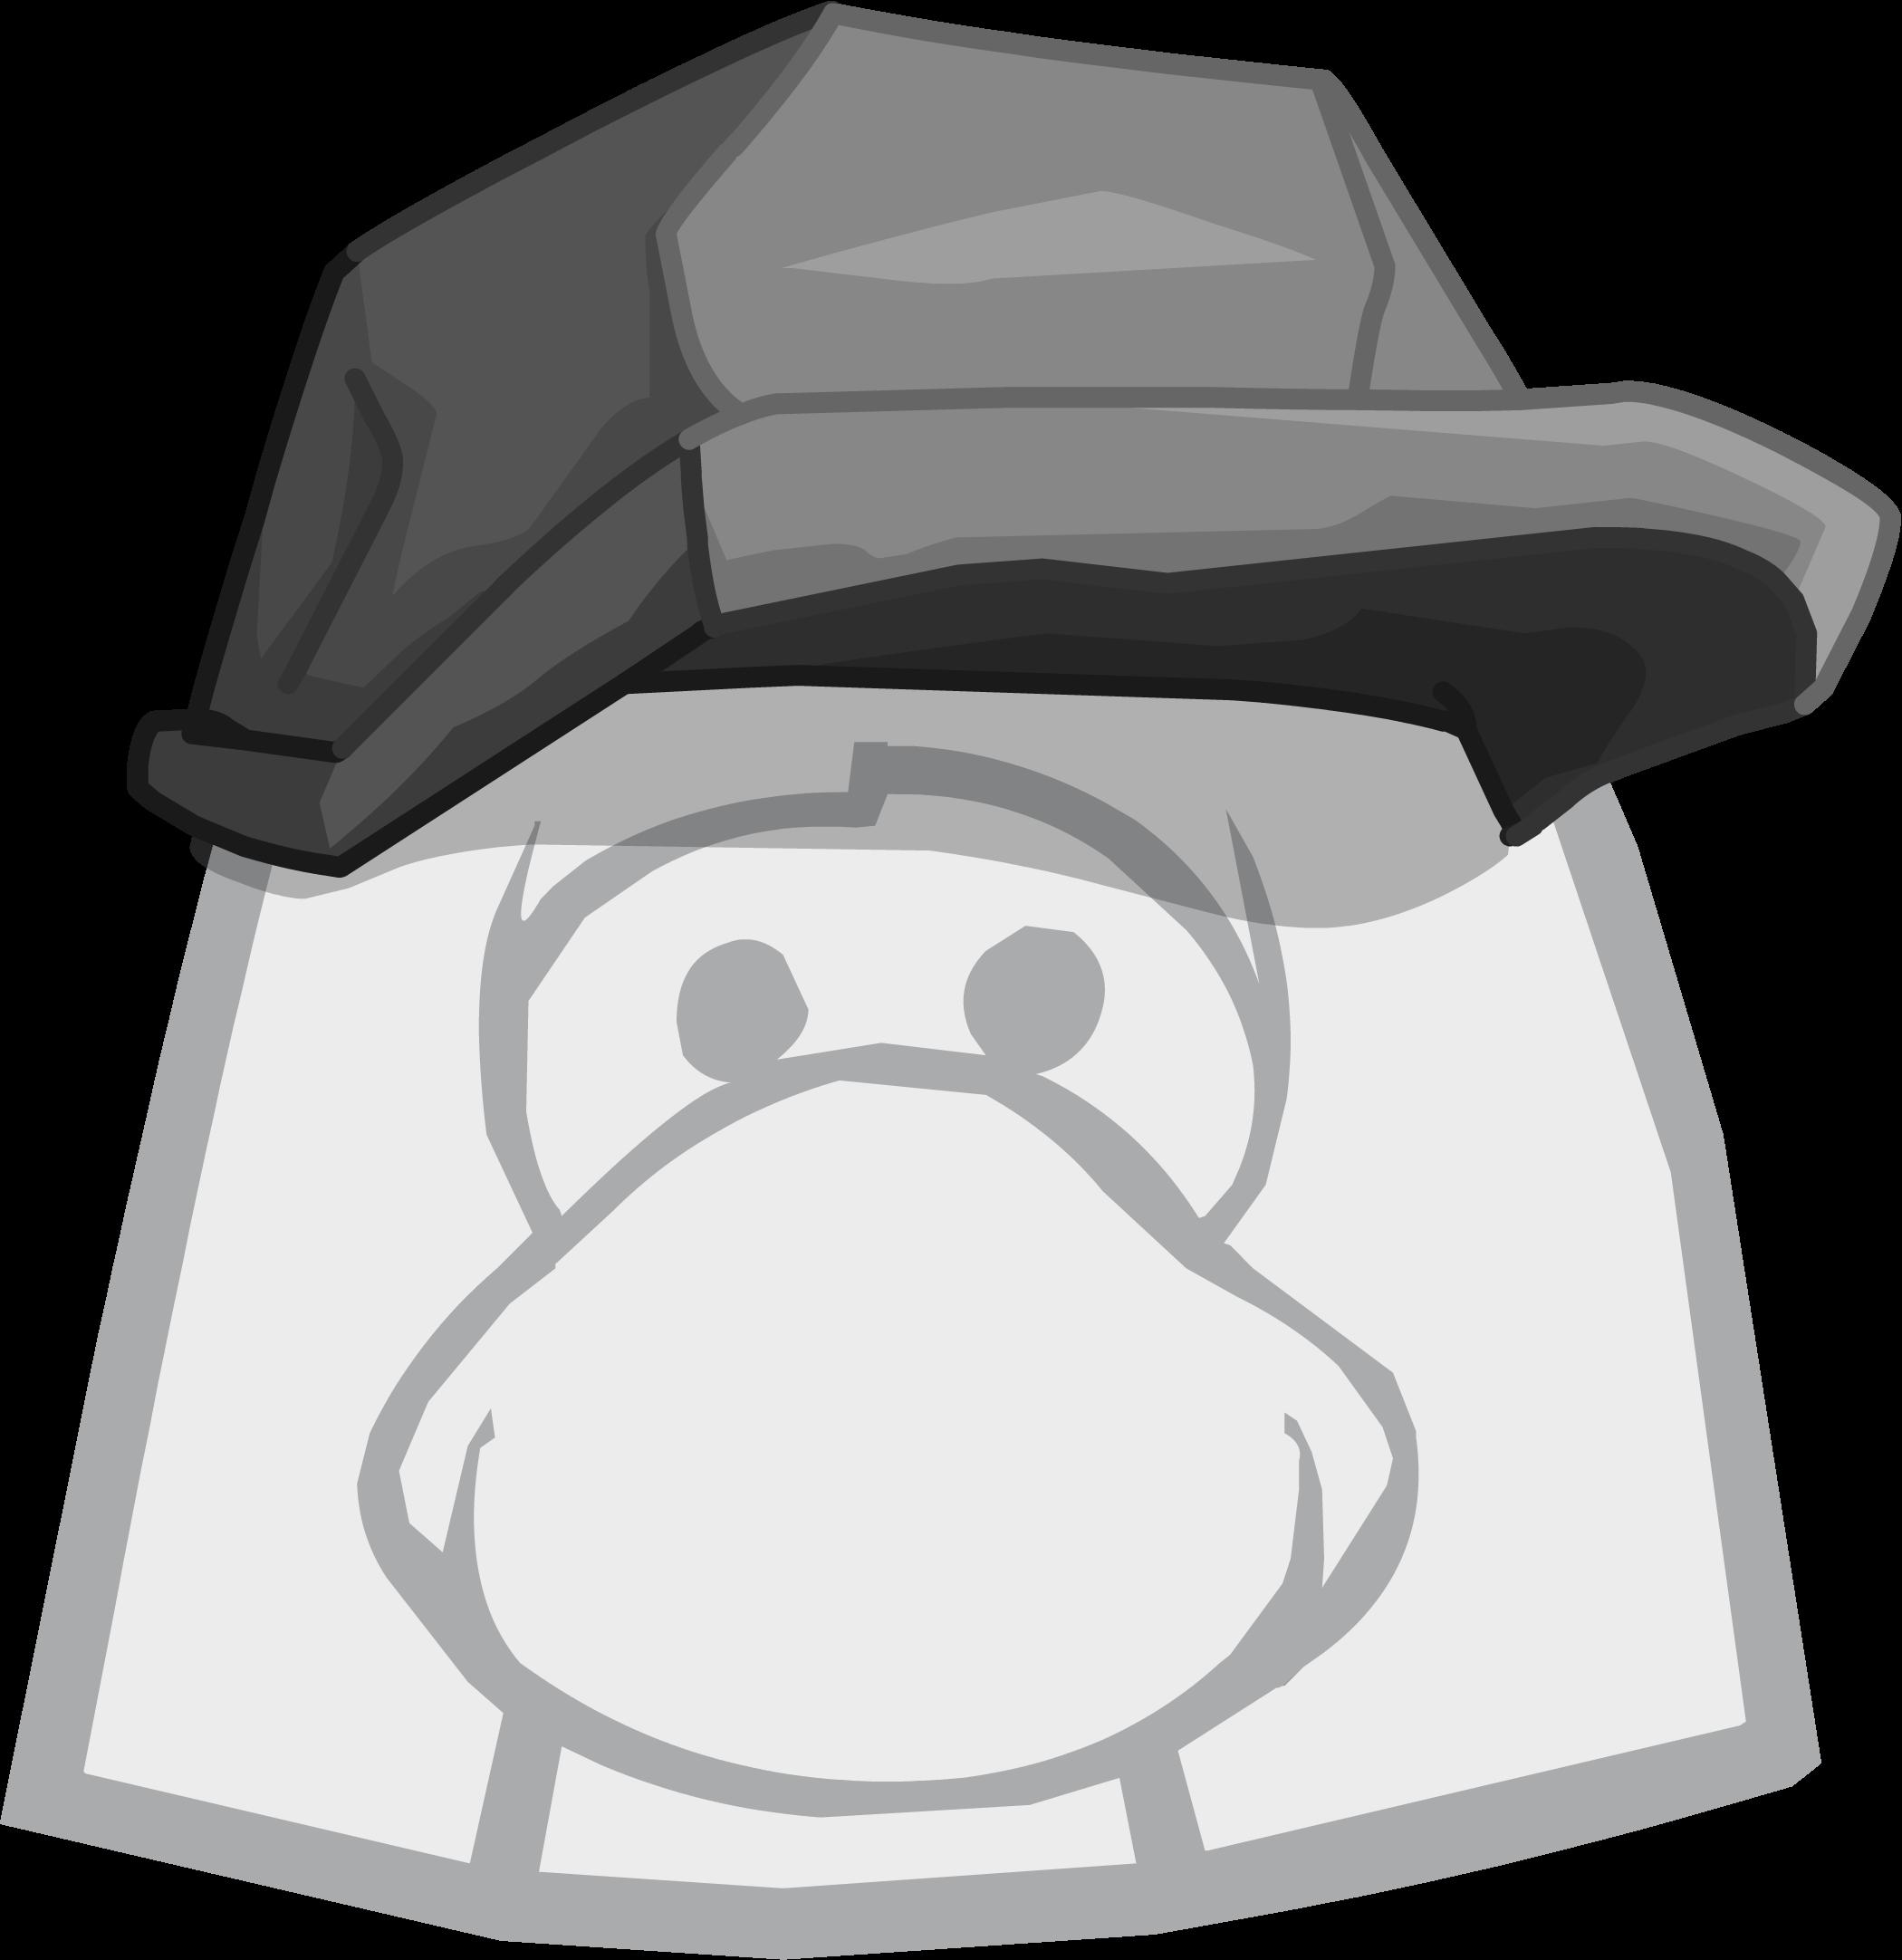 Gorra de Piedra